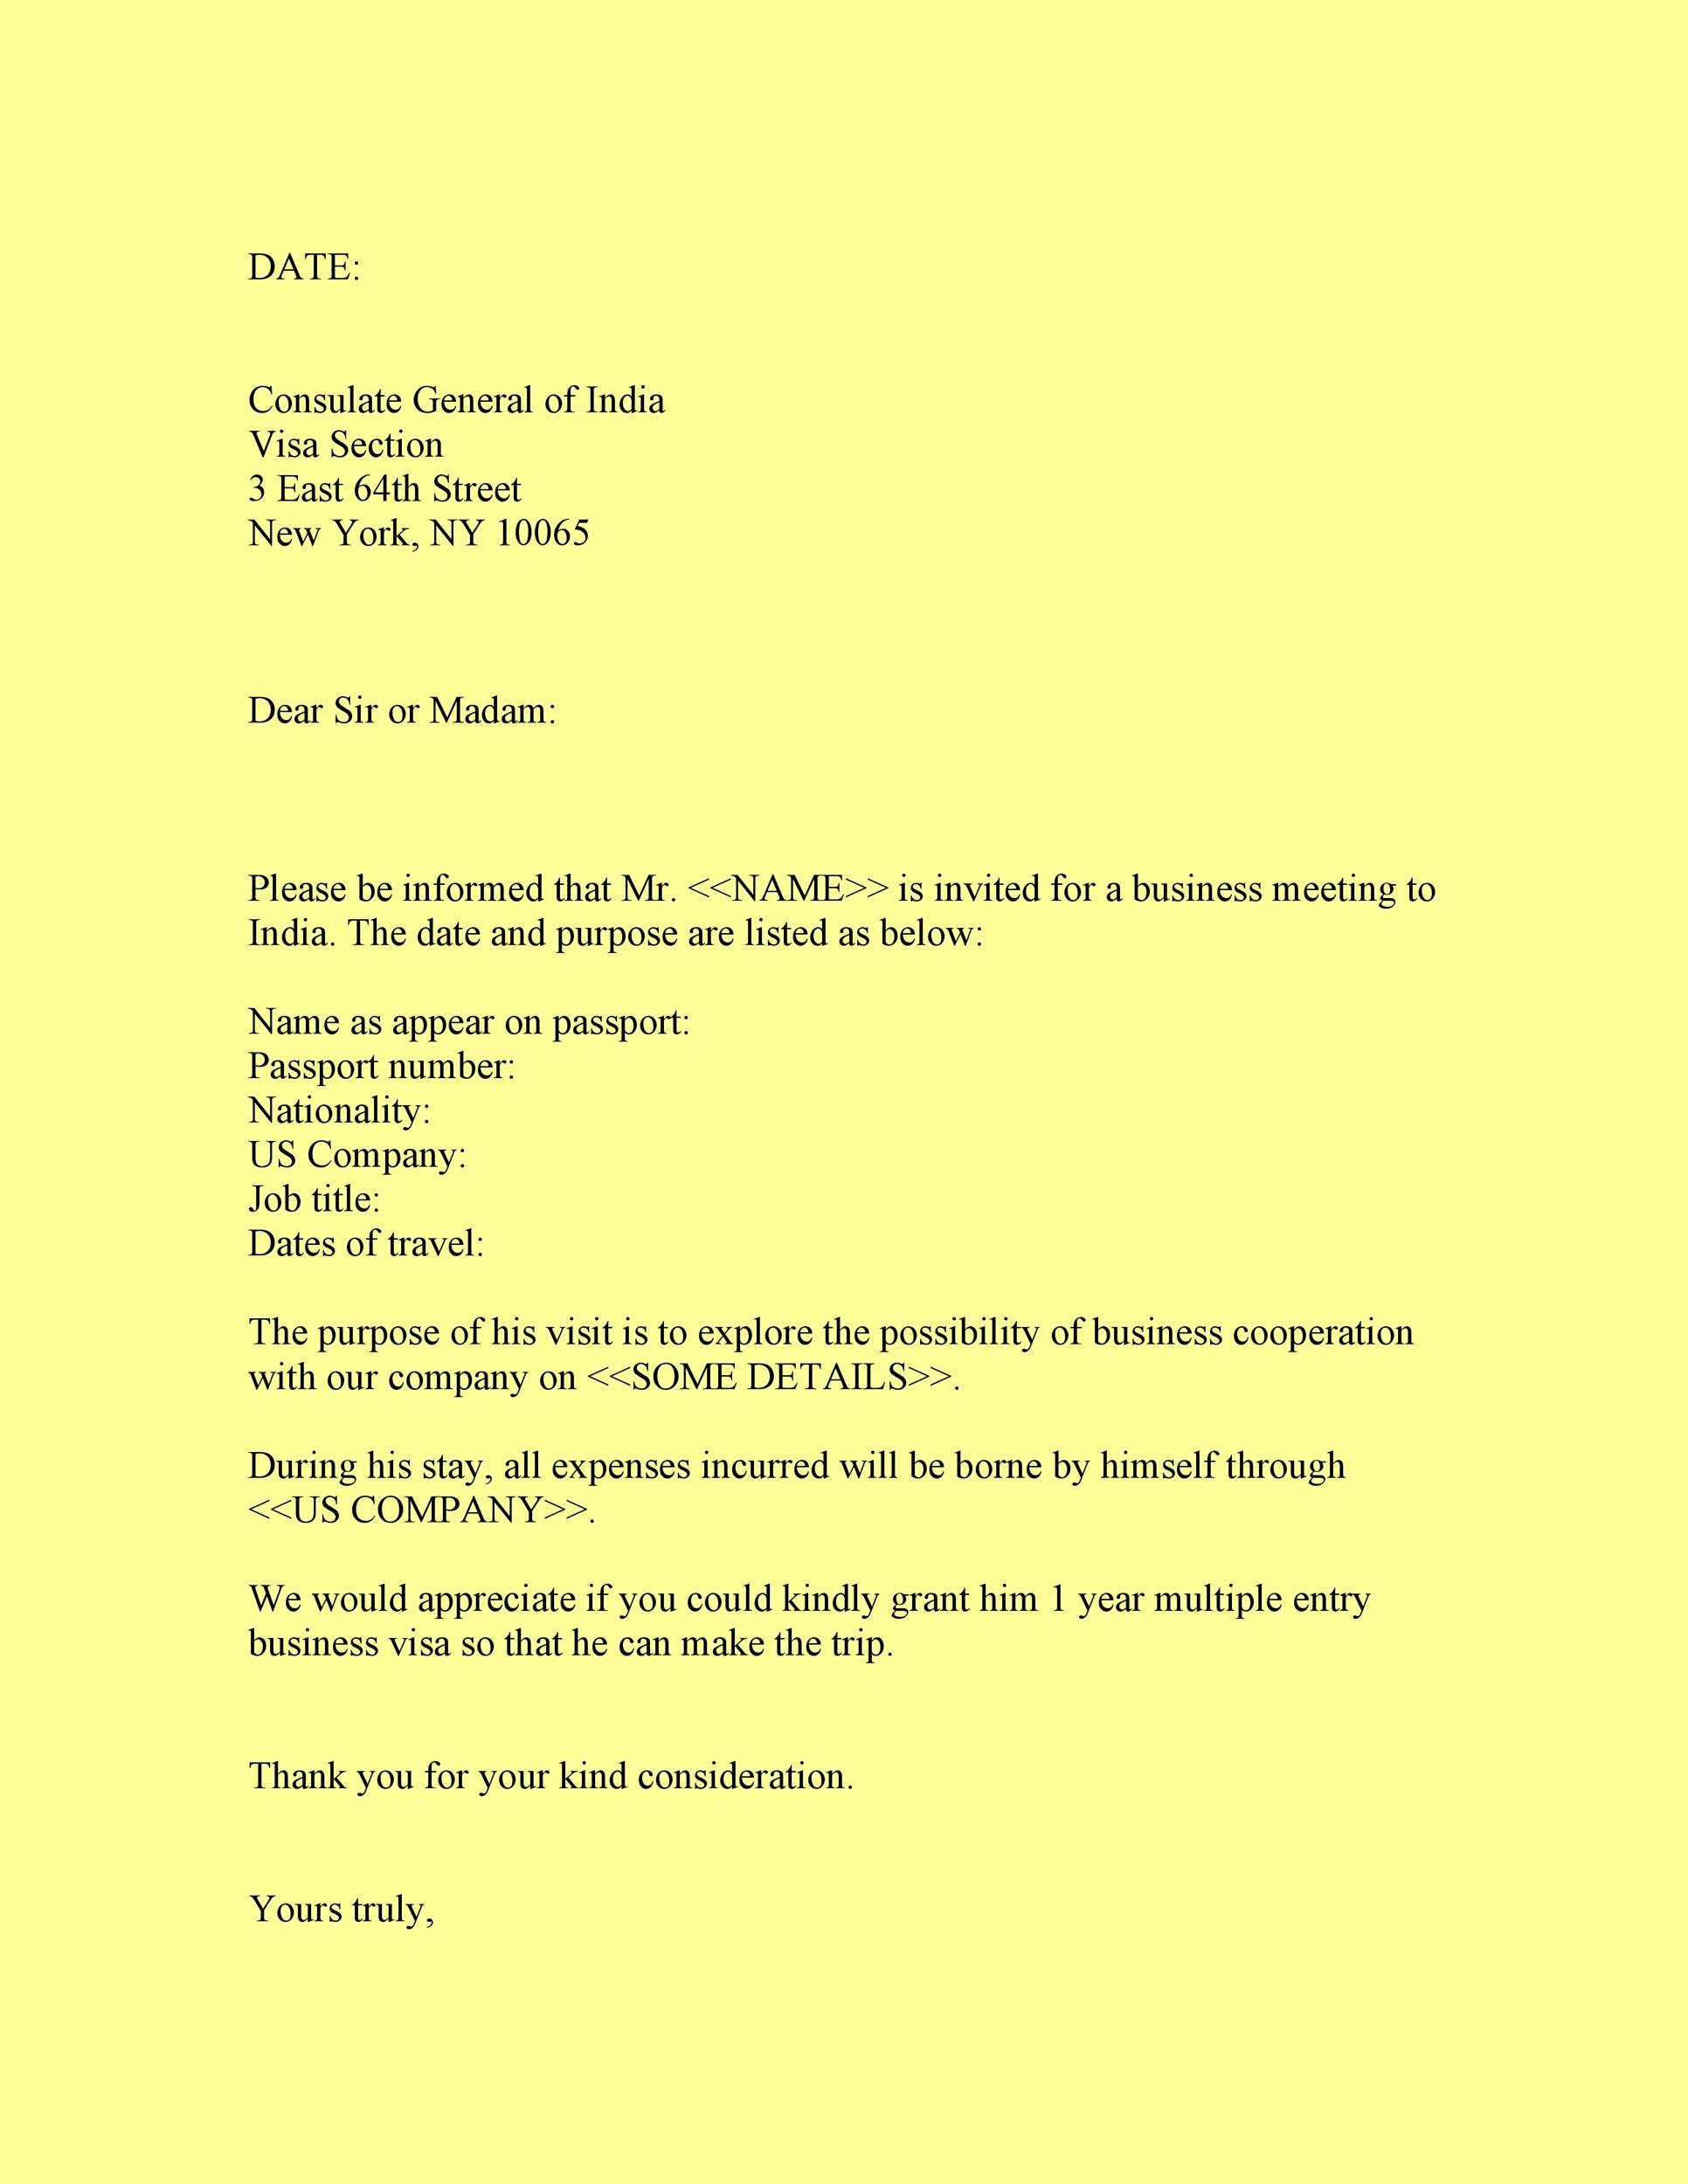 50 Best Invitation Letters (for Visa & General) ᐅ Template Lab